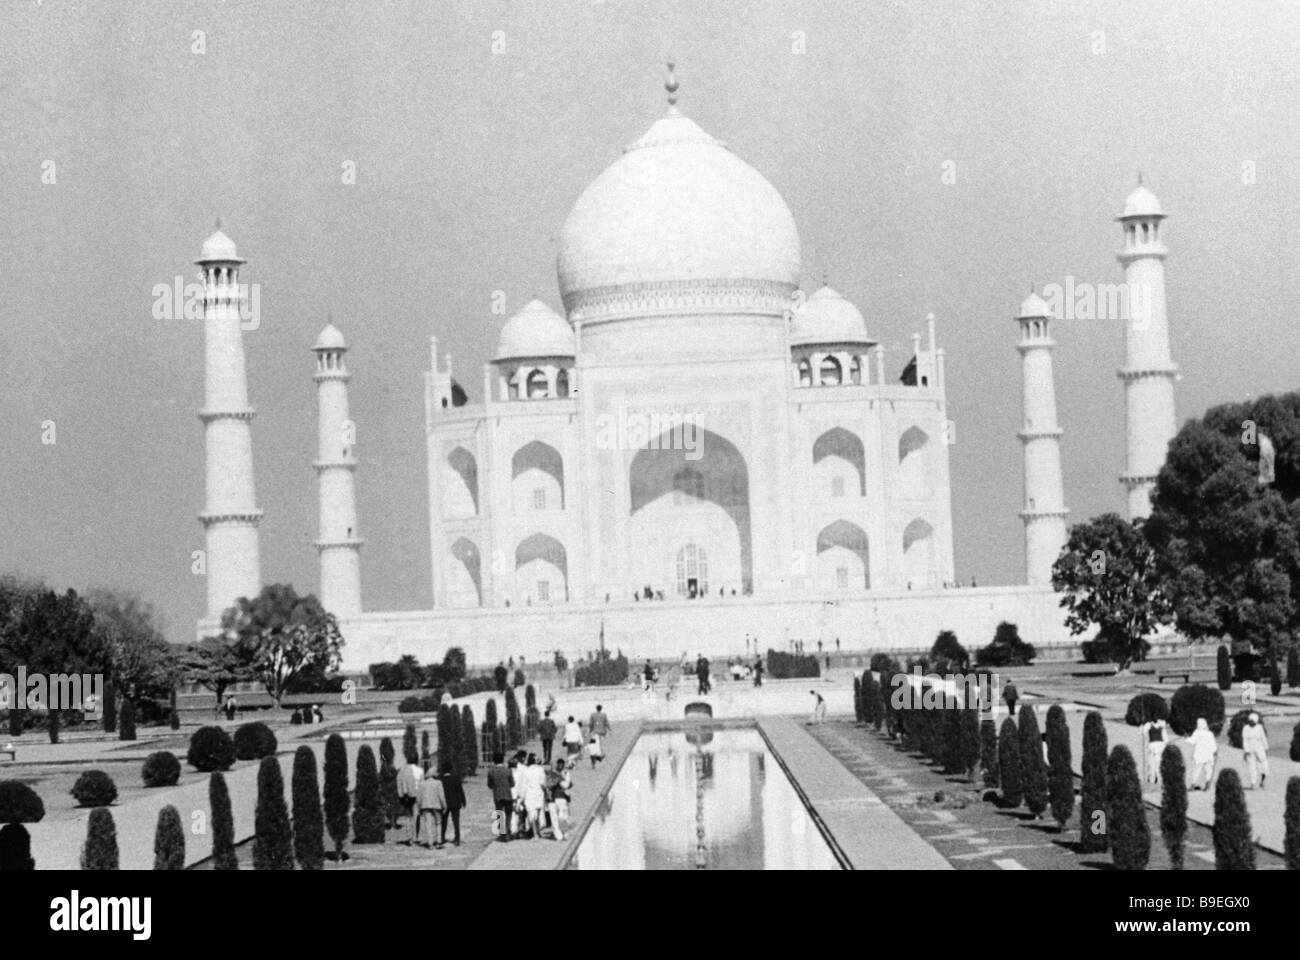 The Taj Mahal mausoleum of Sultan Shah Jahan and his wife Mumtaz Mahal at Agra - Stock Image